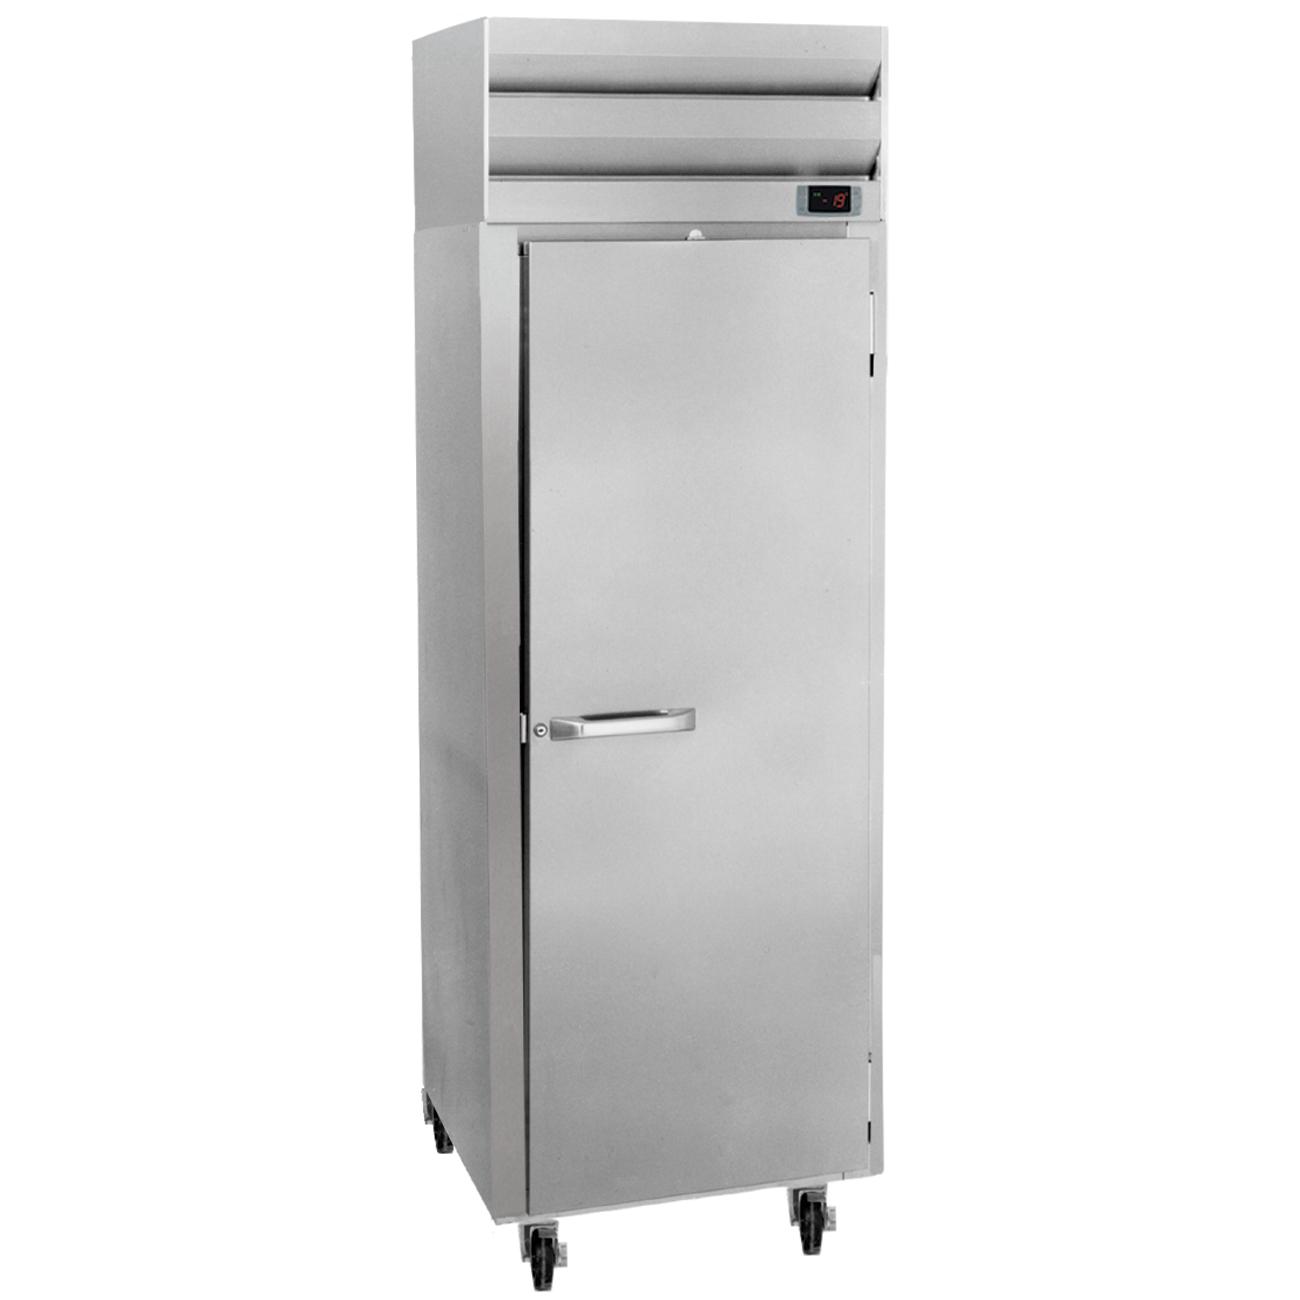 Howard-McCray R-SF22-FF freezer, reach-in